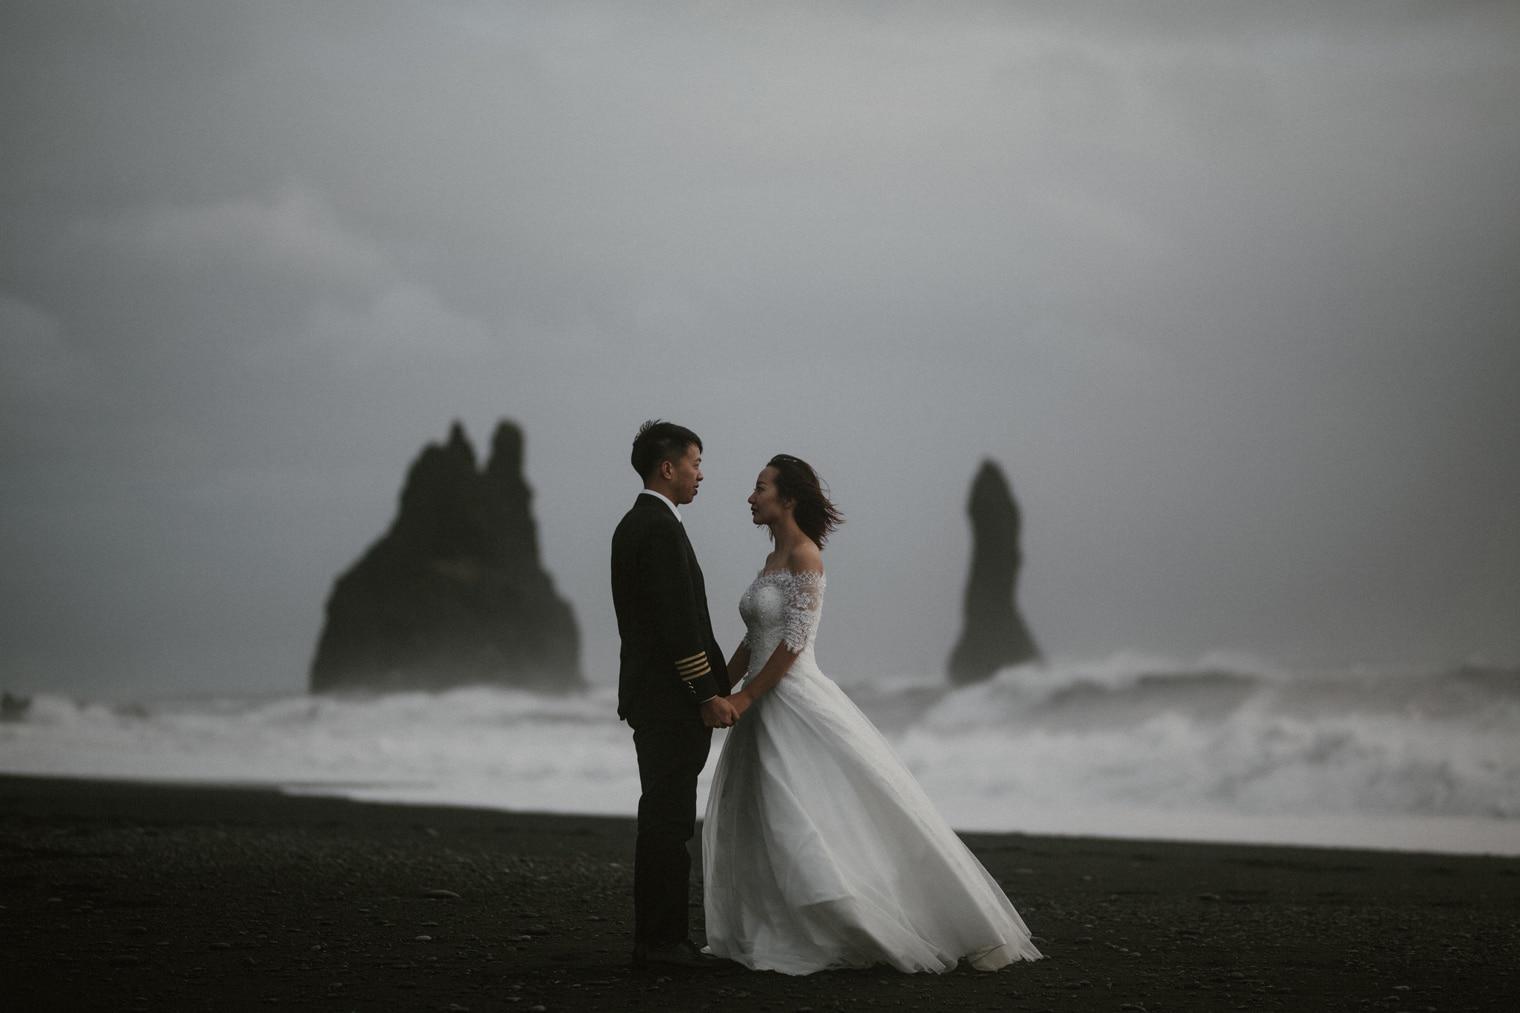 reynisfjara black sand beach iceland wedding